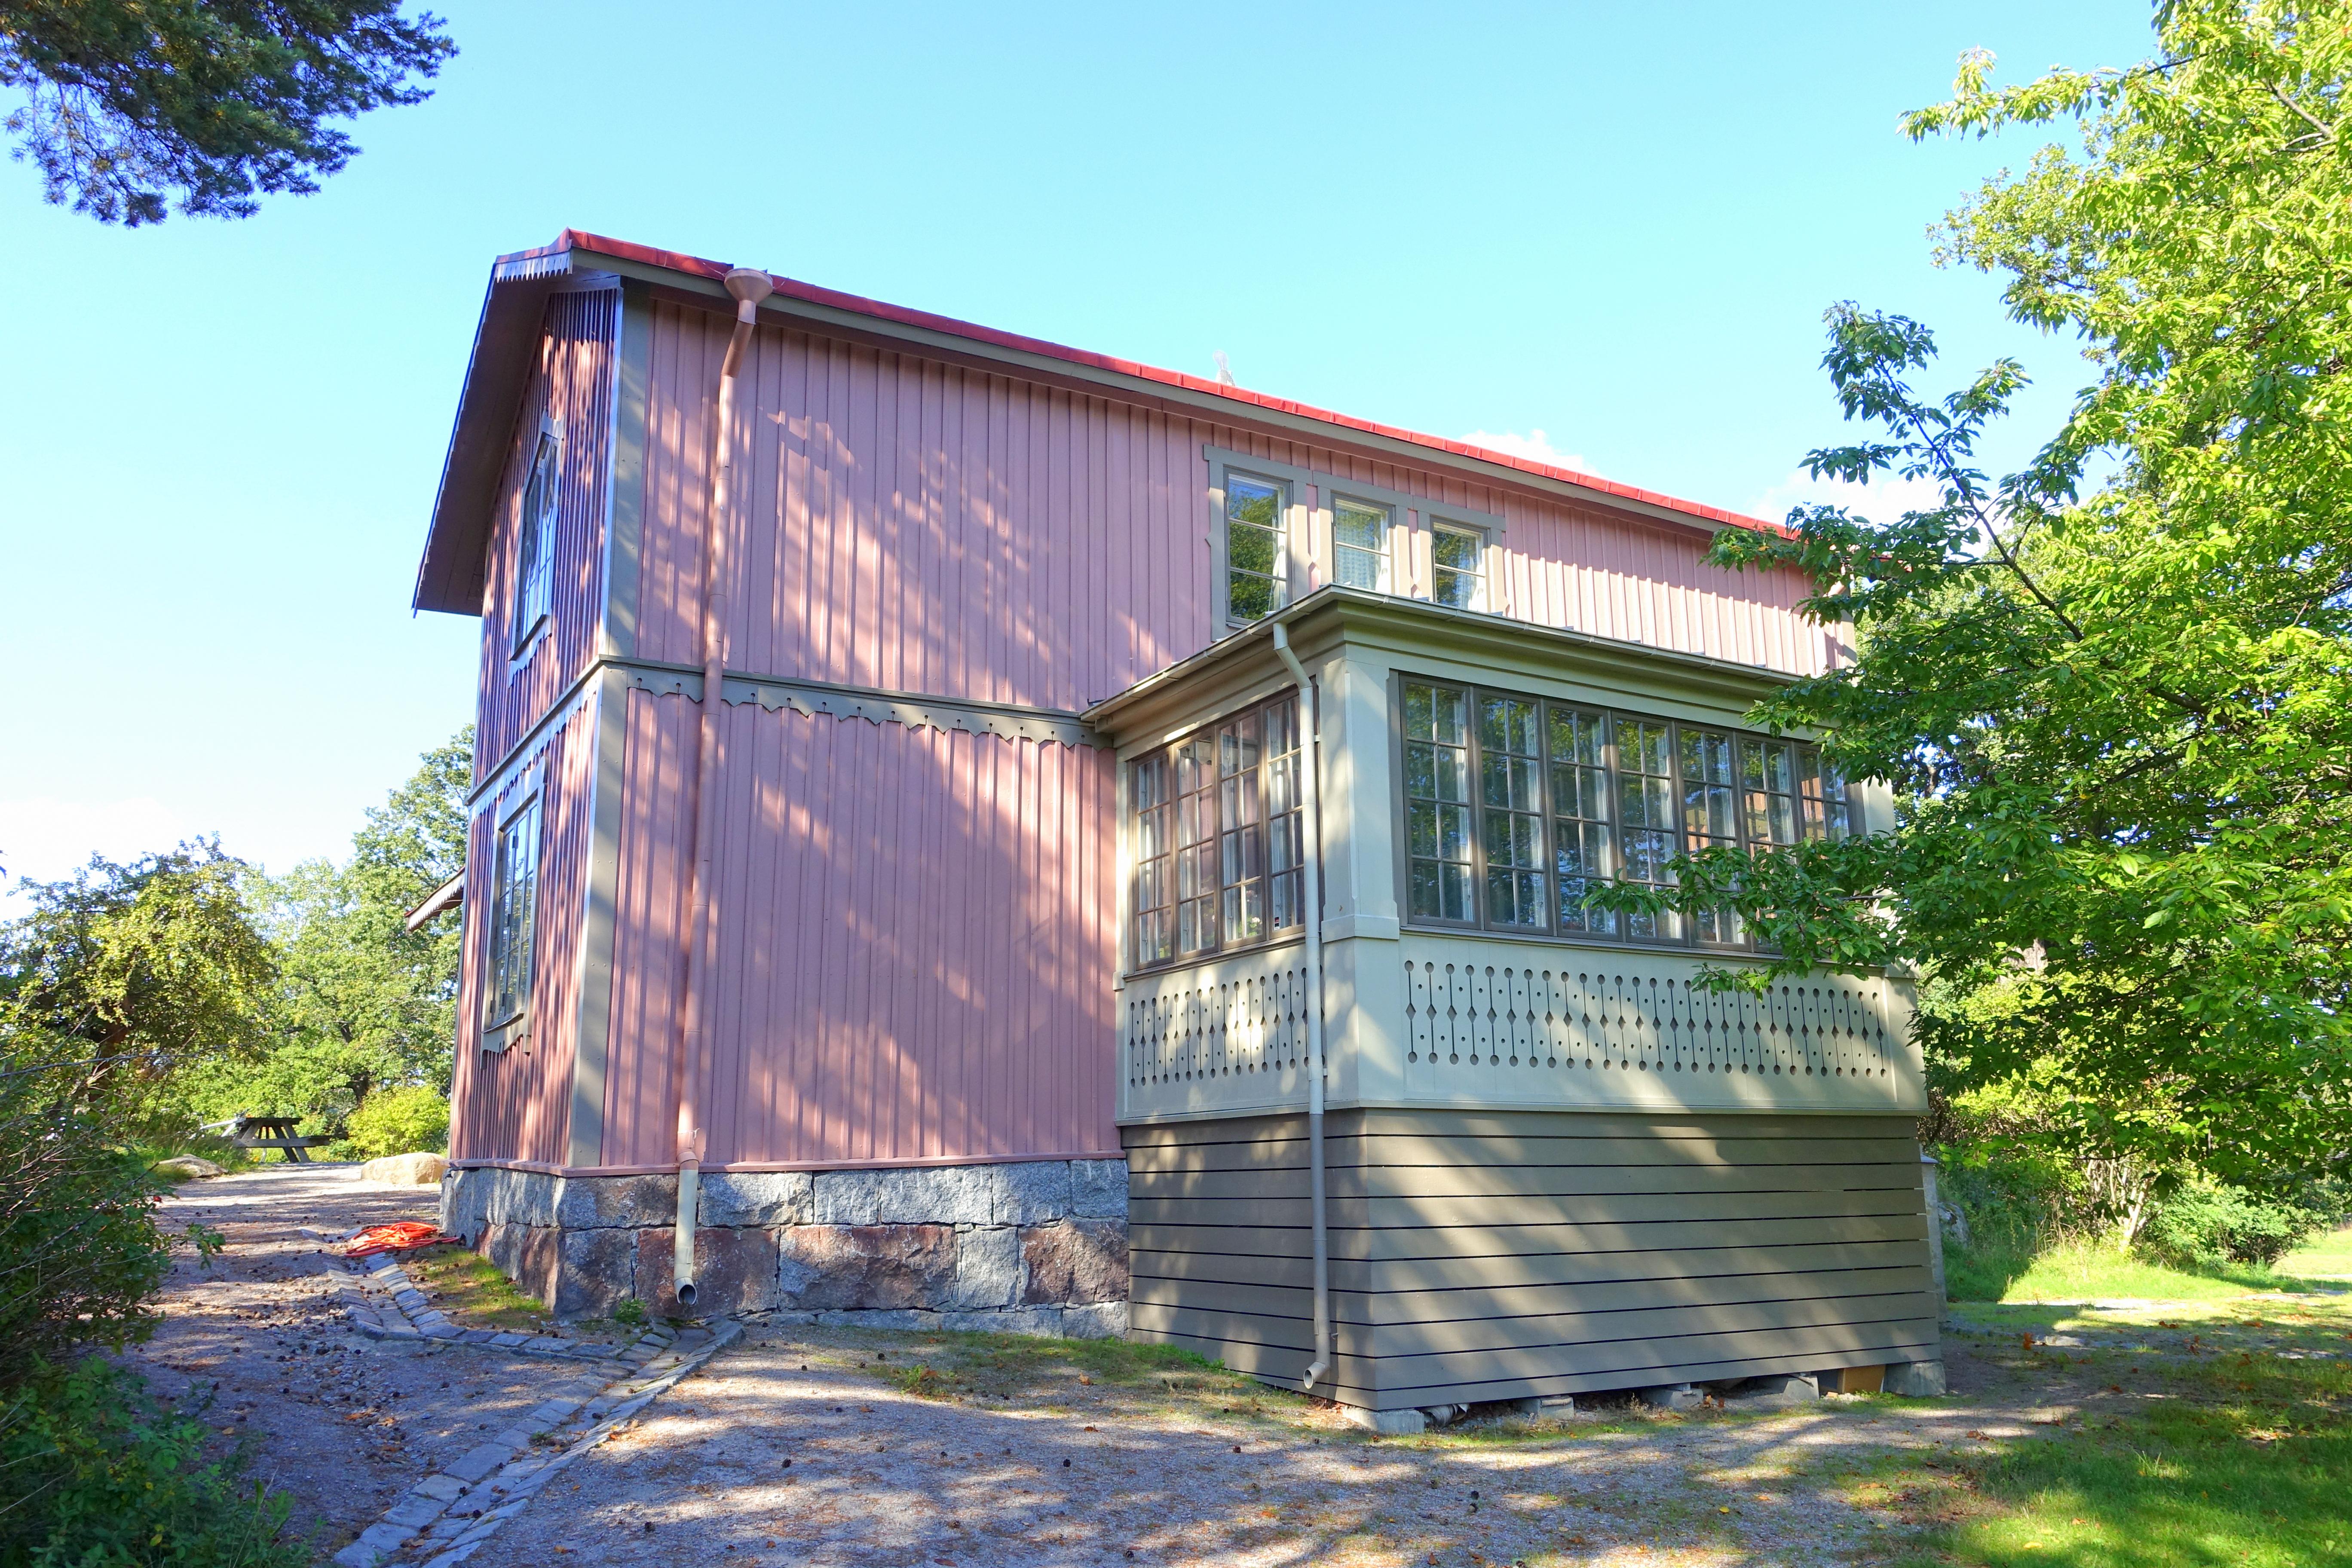 Stora stockholm 2